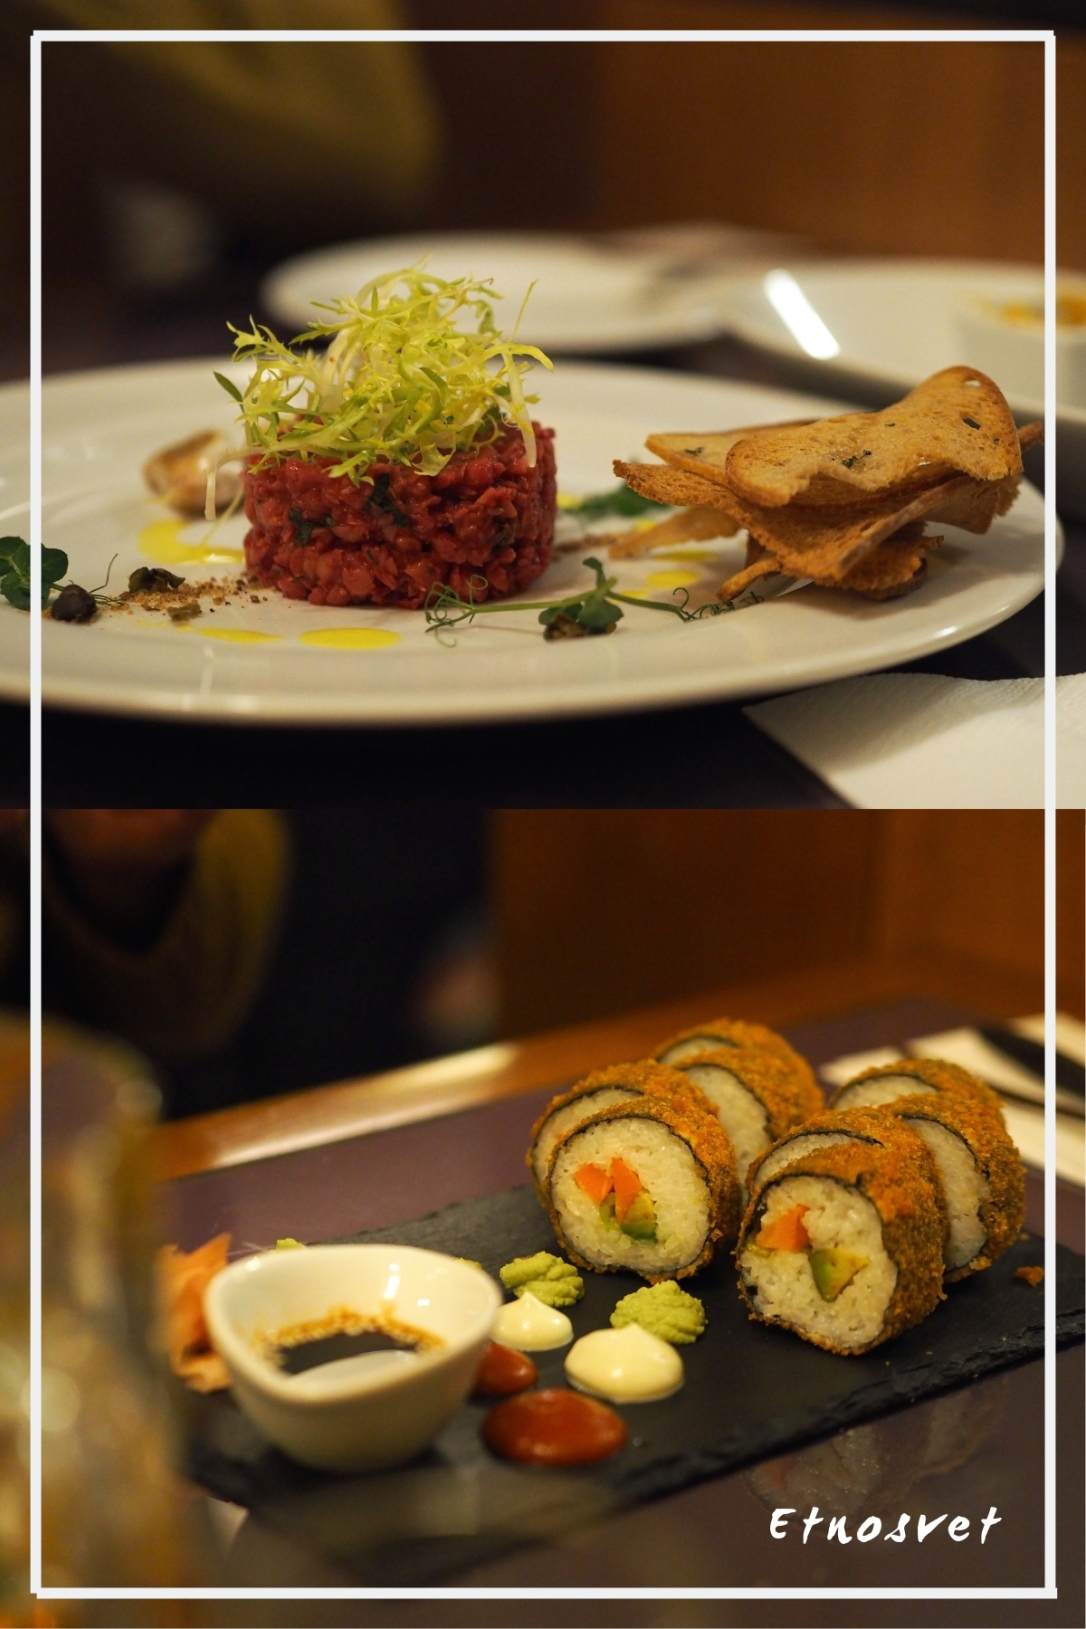 carpaccio and fried sushi at etnosvet vegan restaurant prague